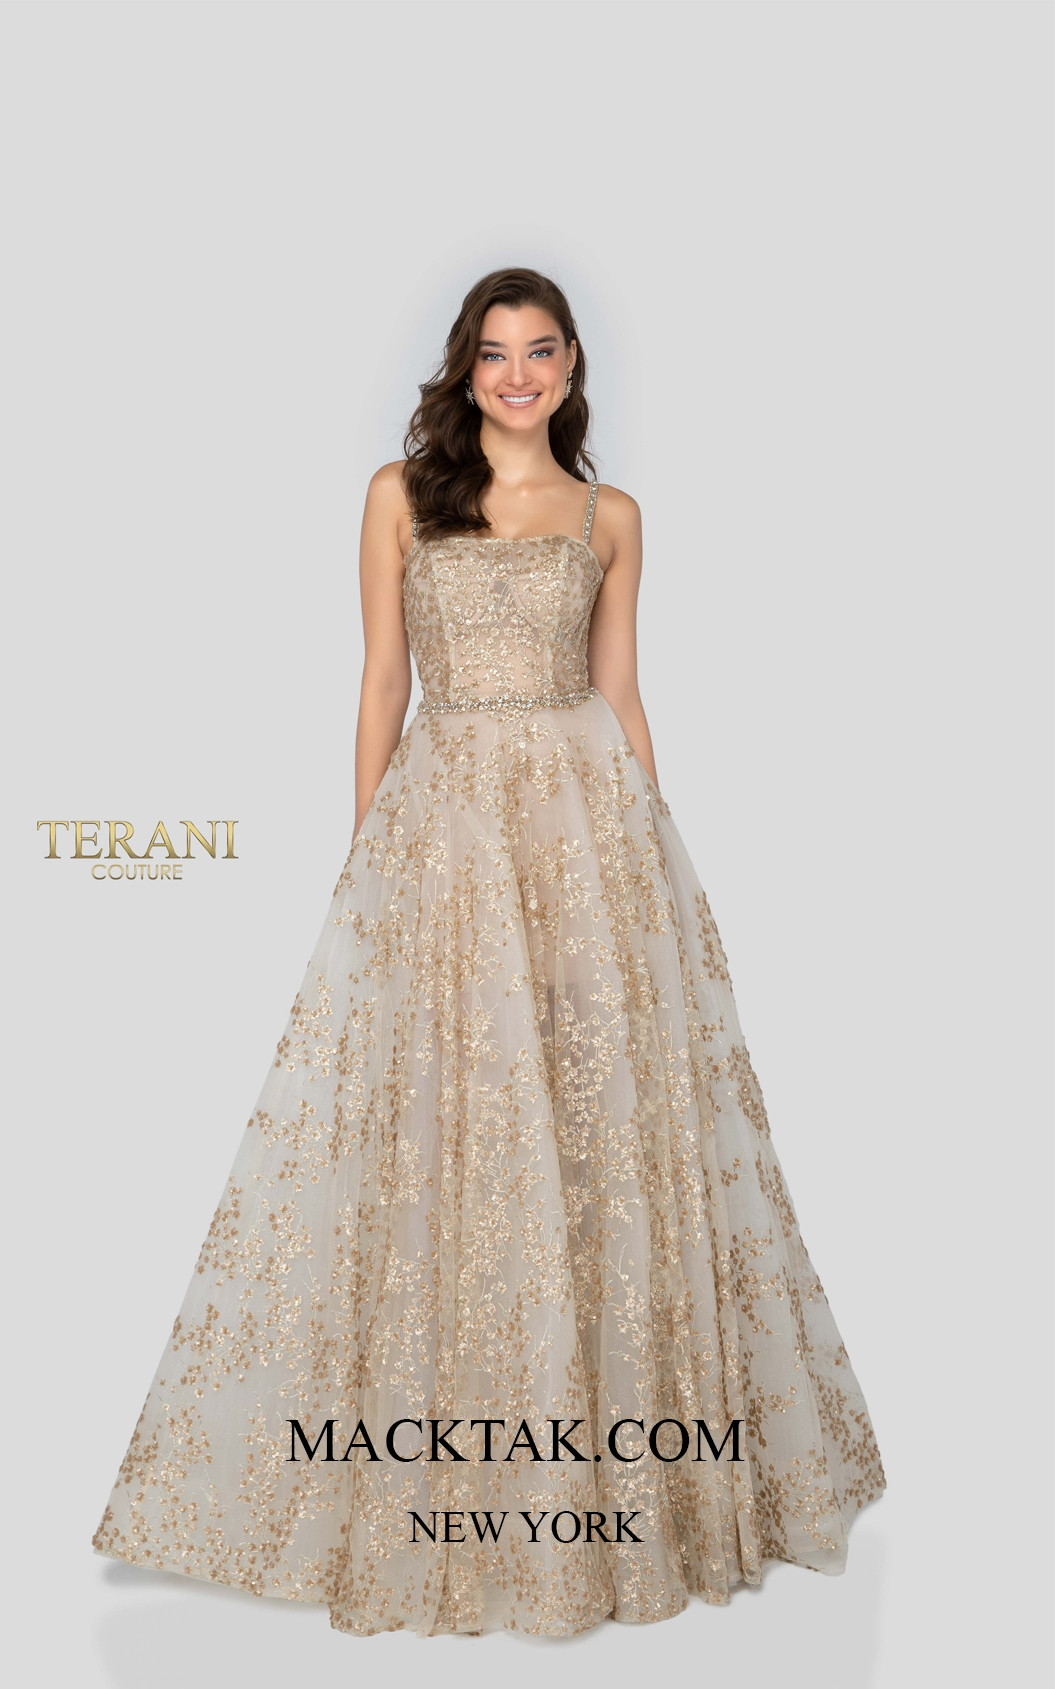 Terani 1912P8576 Front Dress